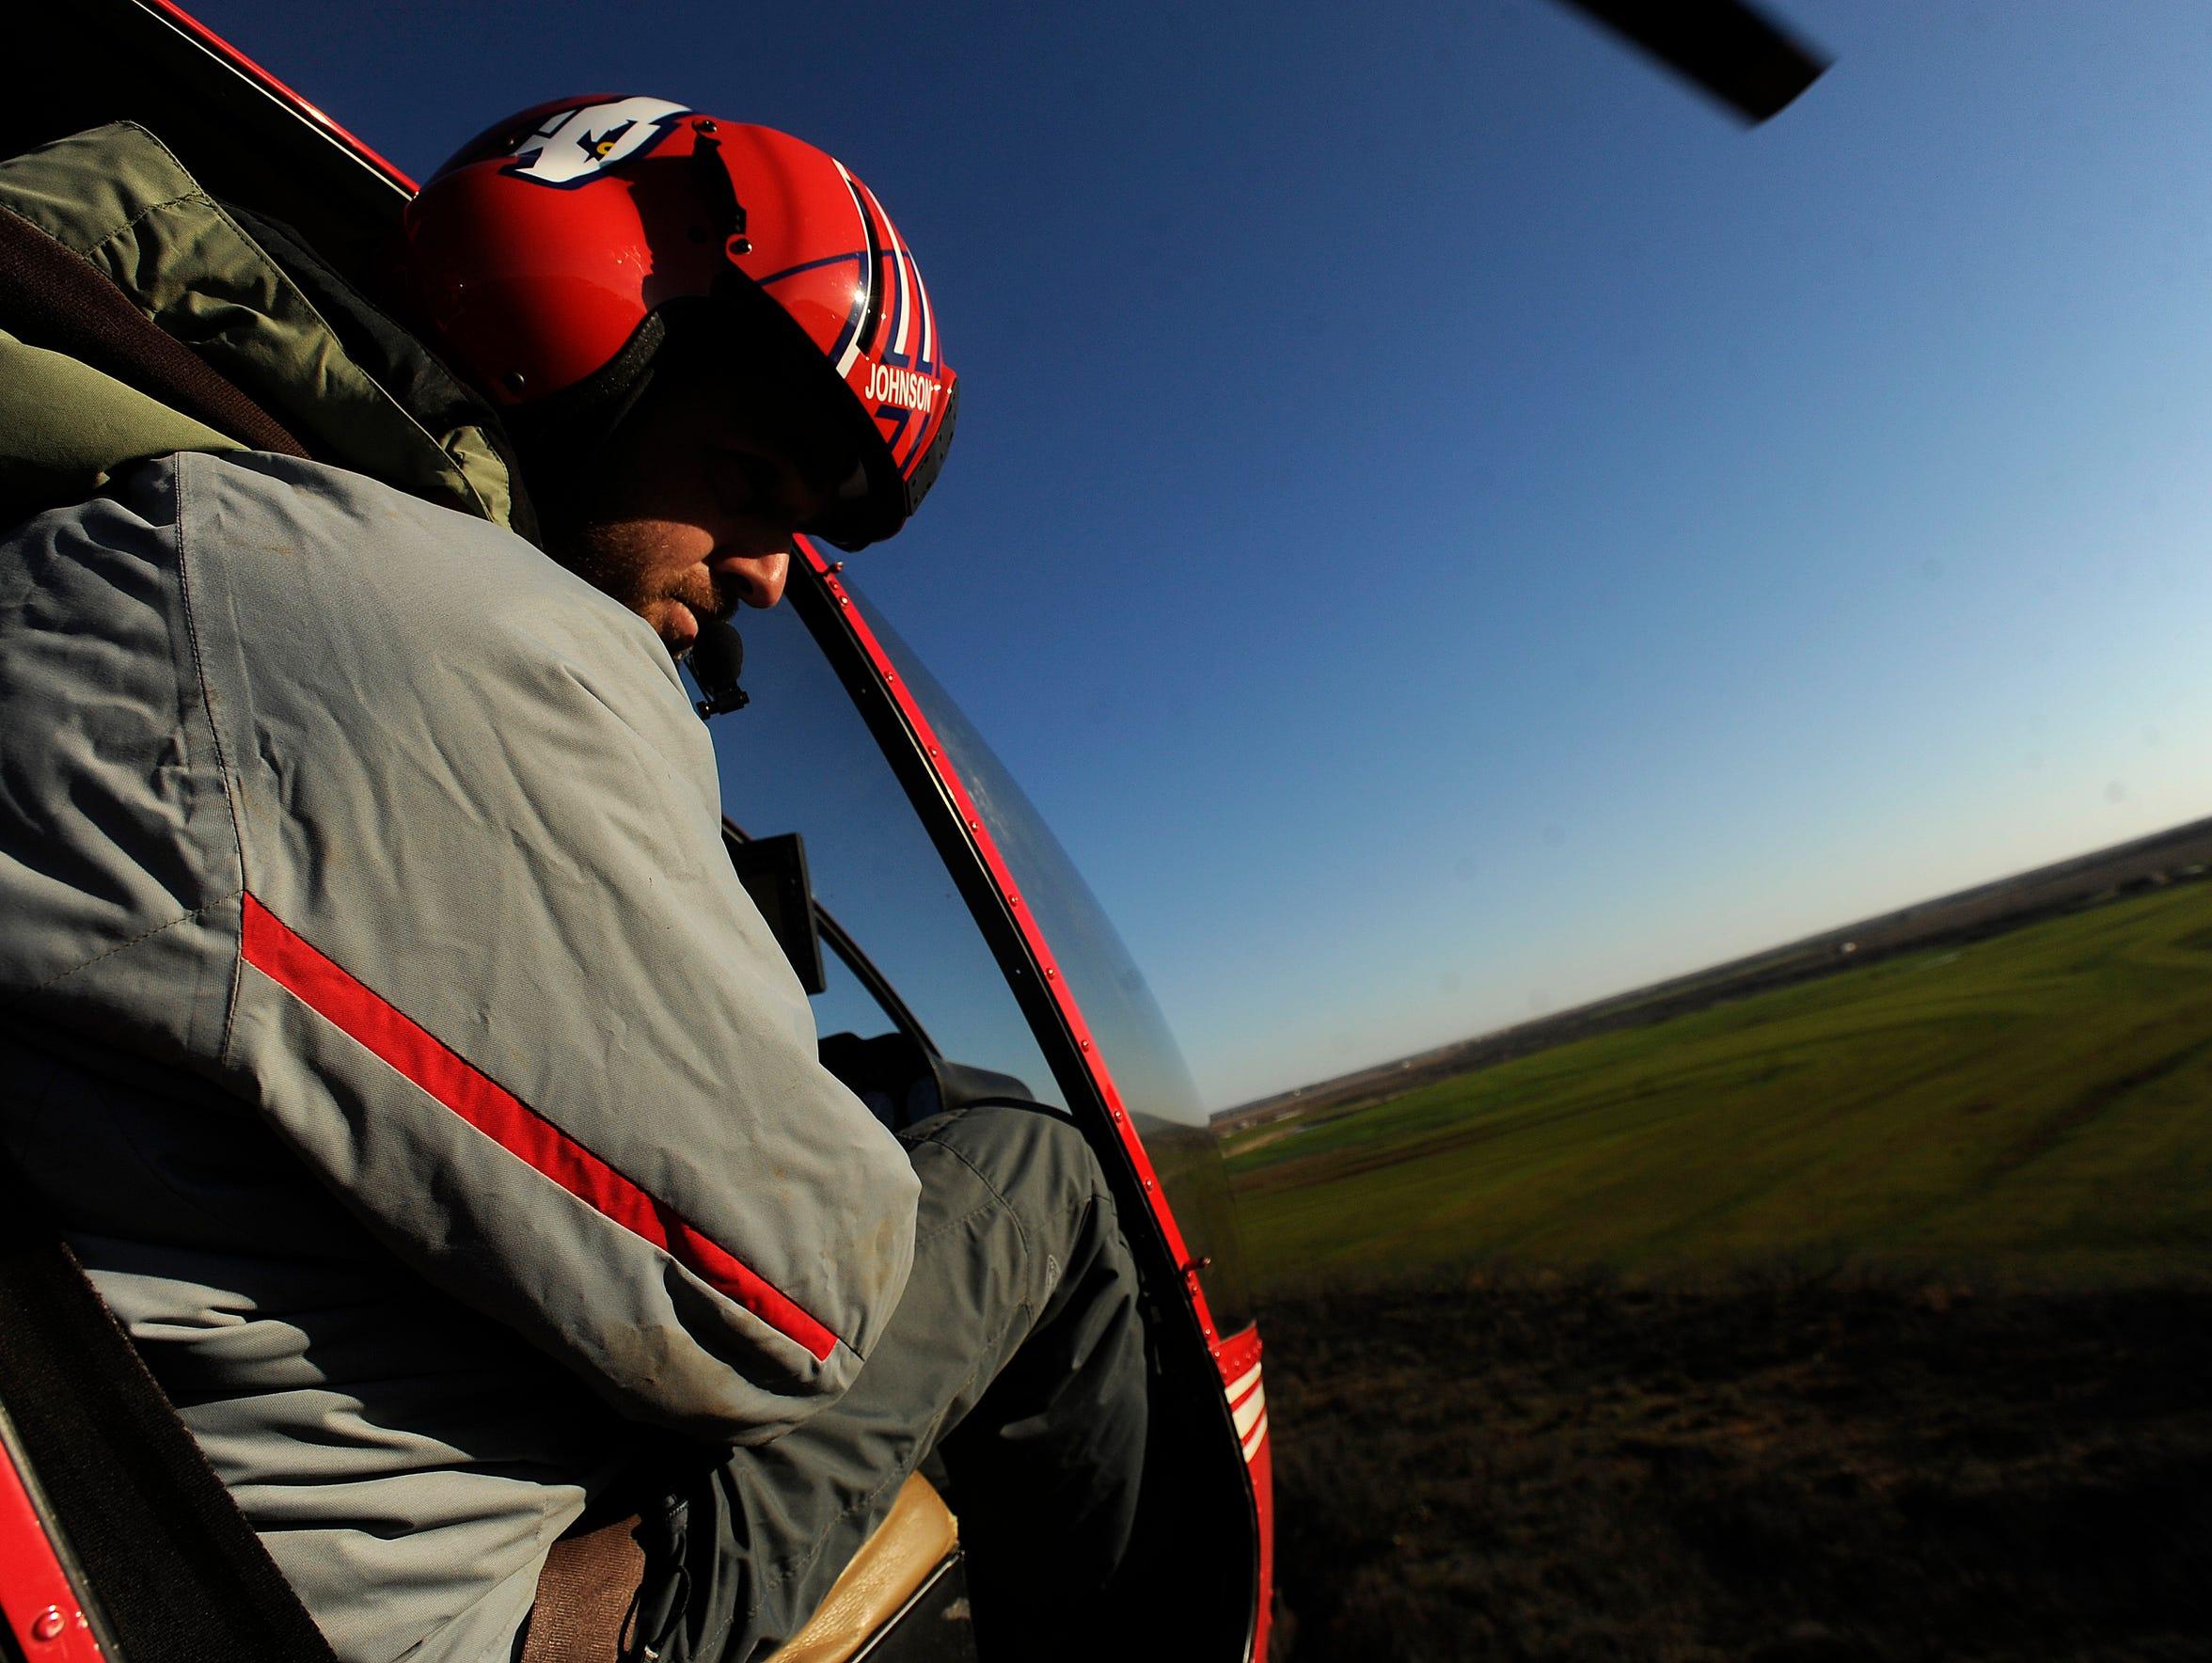 Cedar Ridge Aviation owner/pilot Dustin Johnson looks